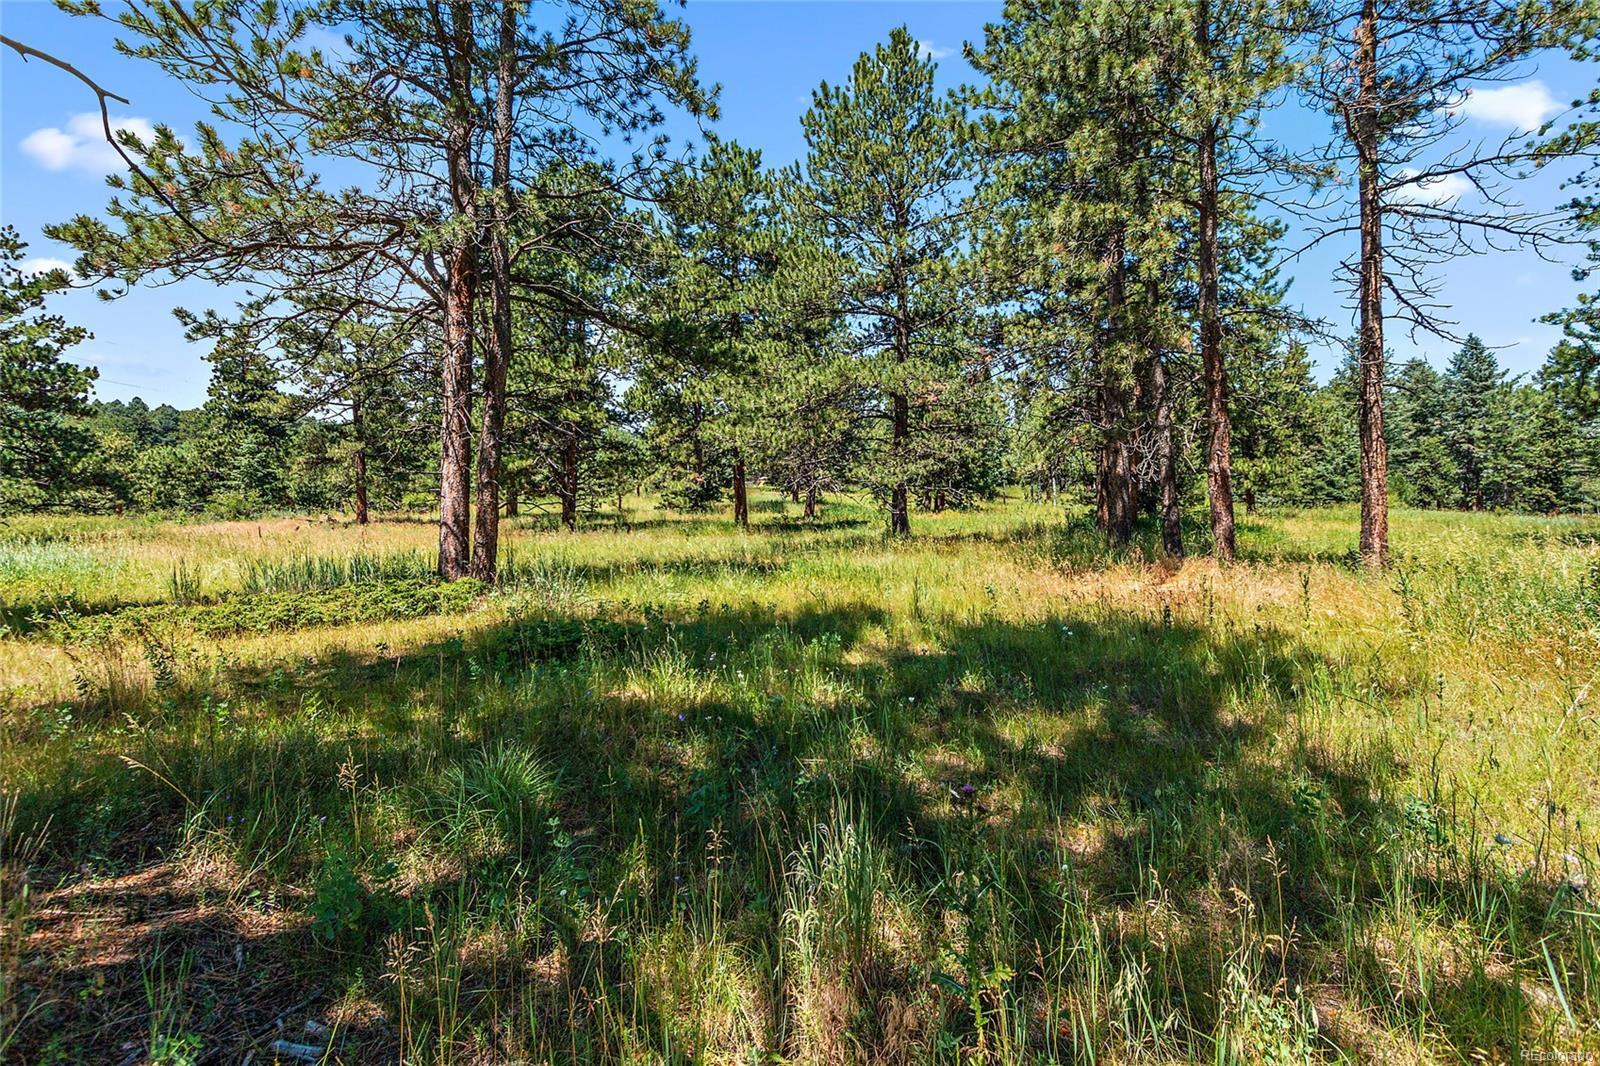 8197 Centaur Drive, Evergreen, CO 80439 - Evergreen, CO real estate listing